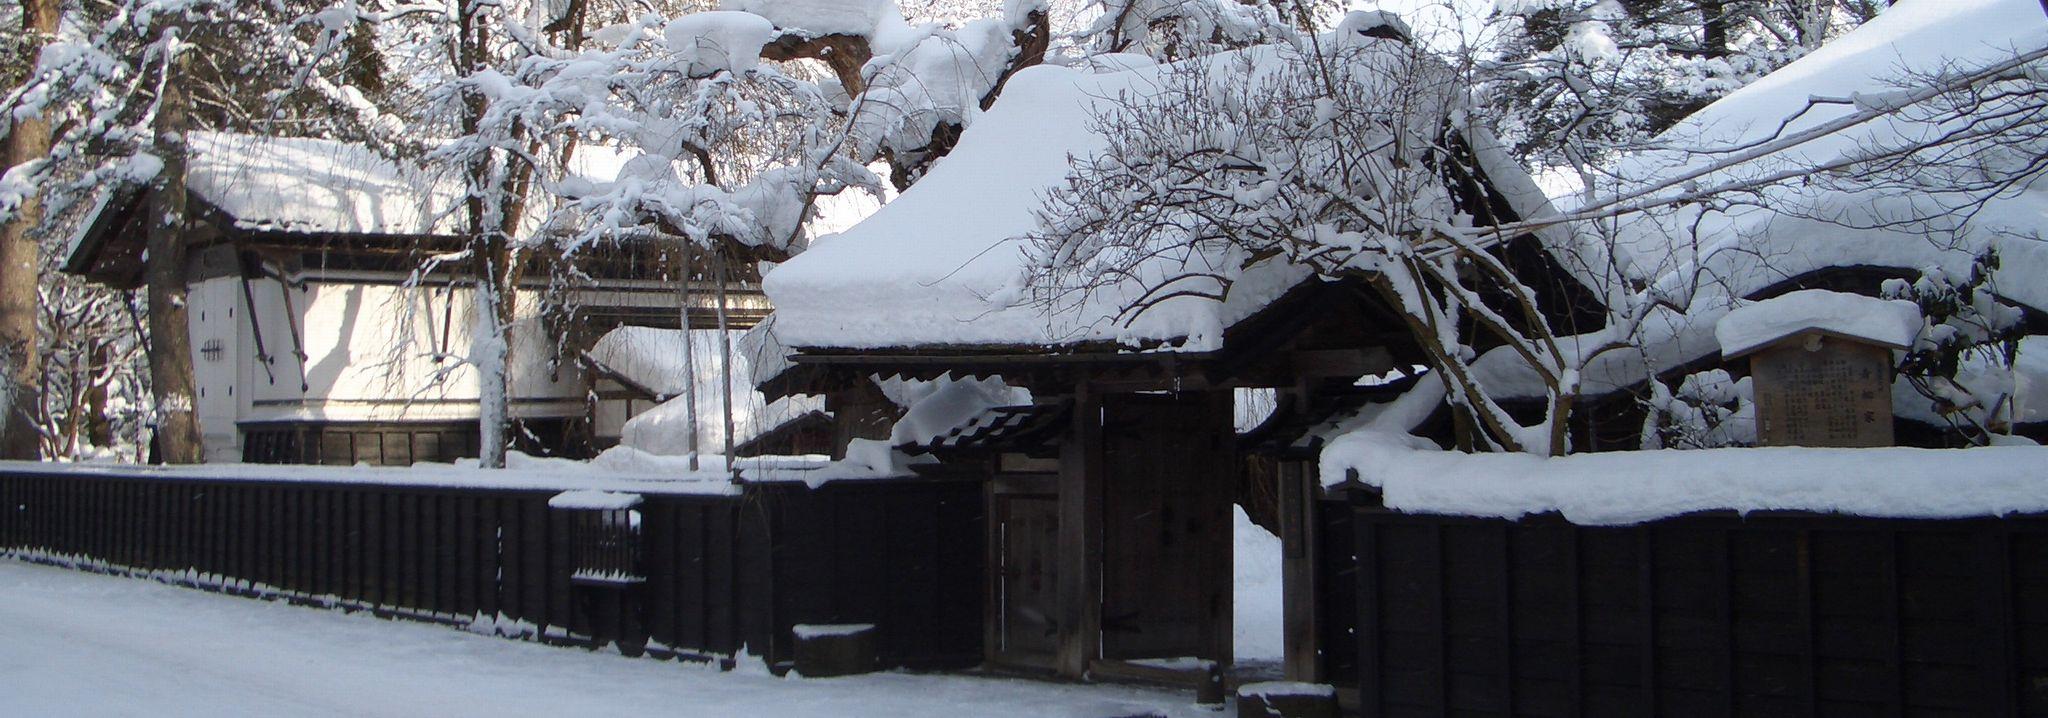 角館武家屋敷の冬